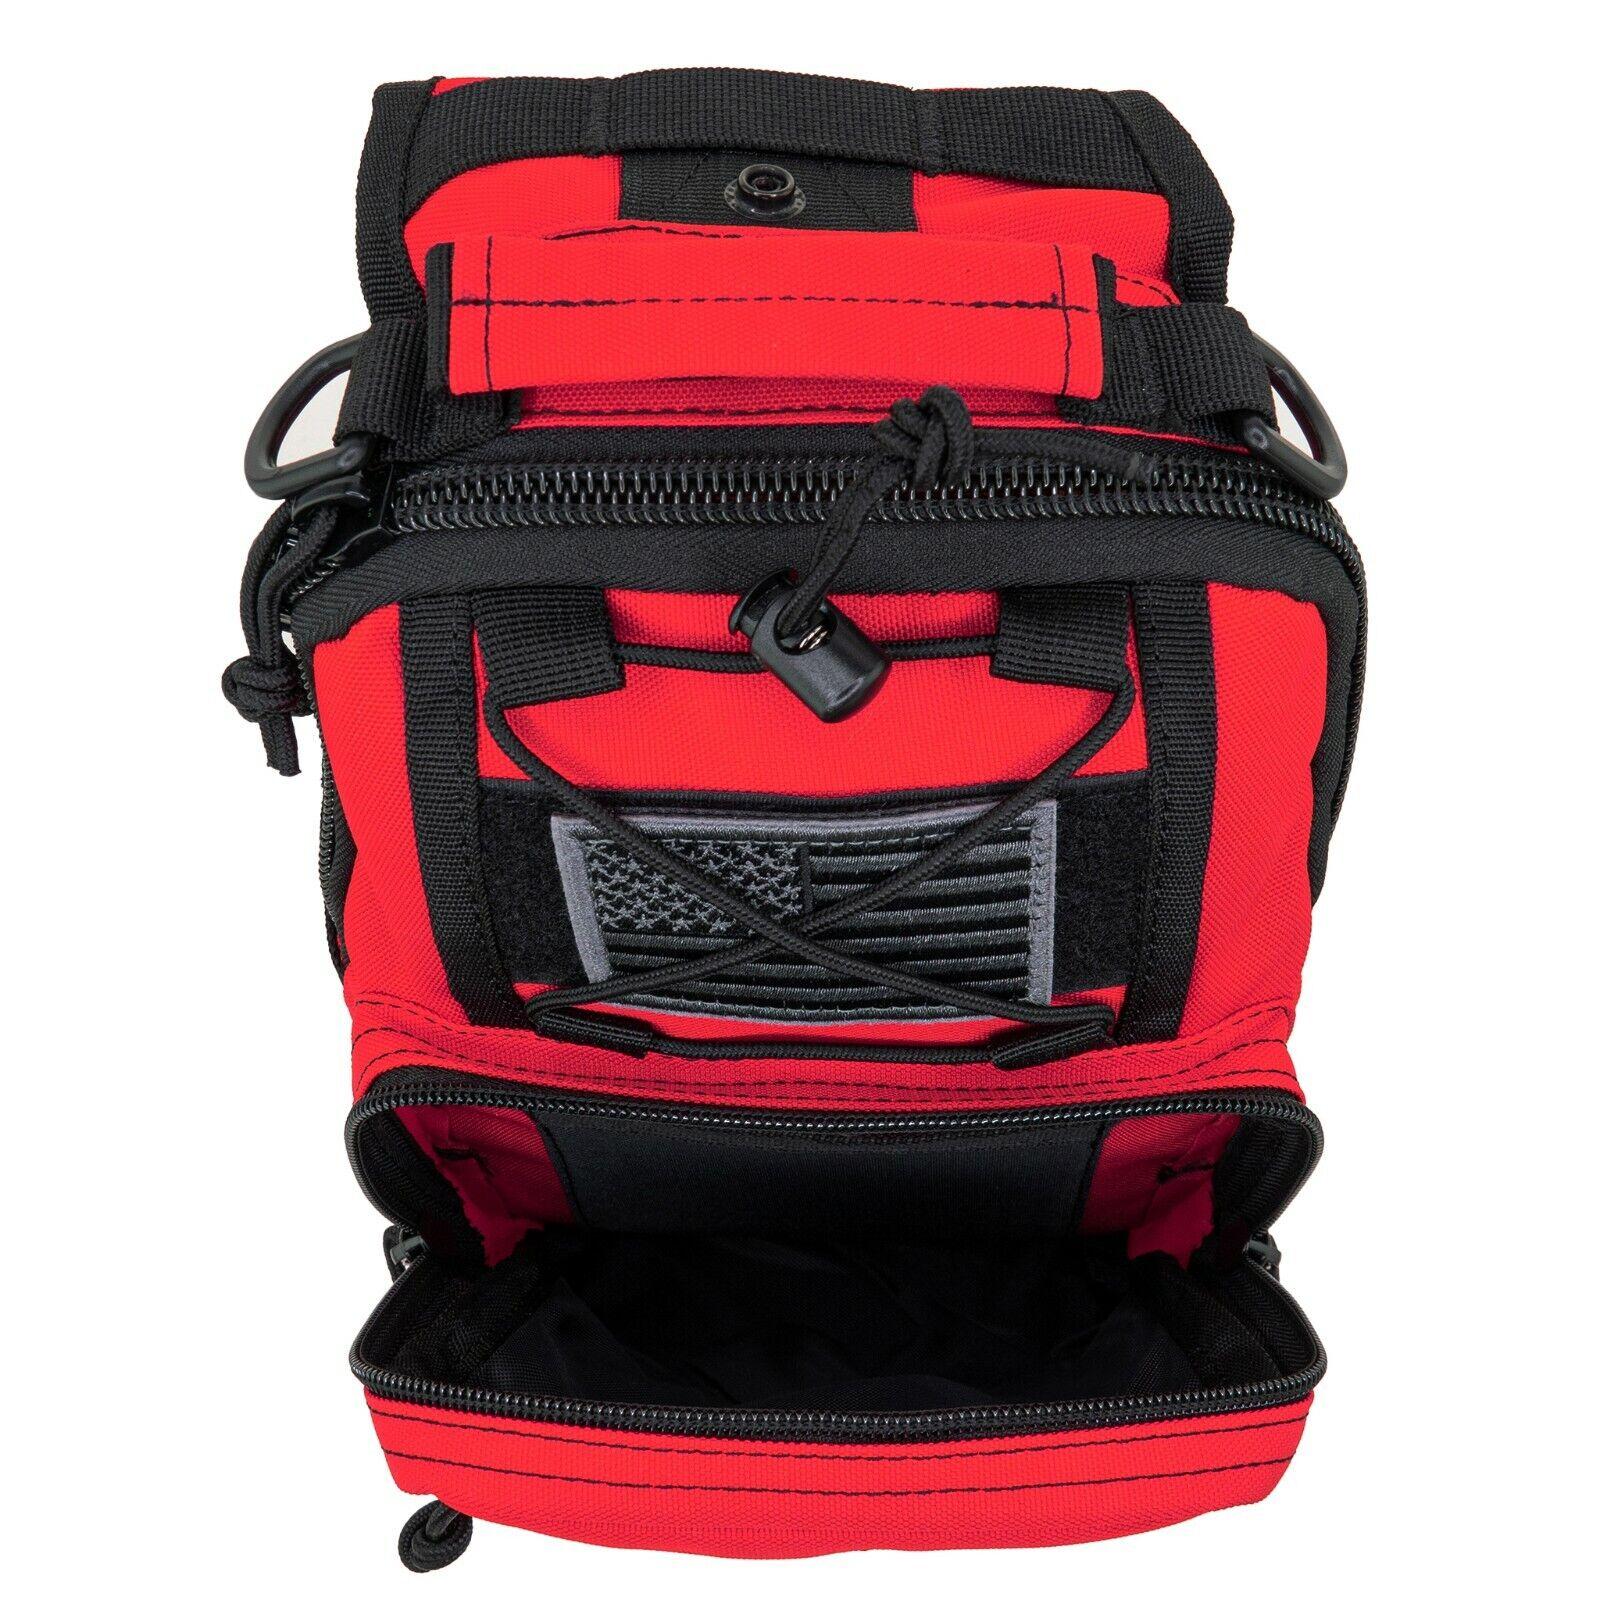 NEW LINE2DESIGN FIRST AID SLING BACKPACK - EMS EMERGENCY MEDICAL MOLLE BAG - RED